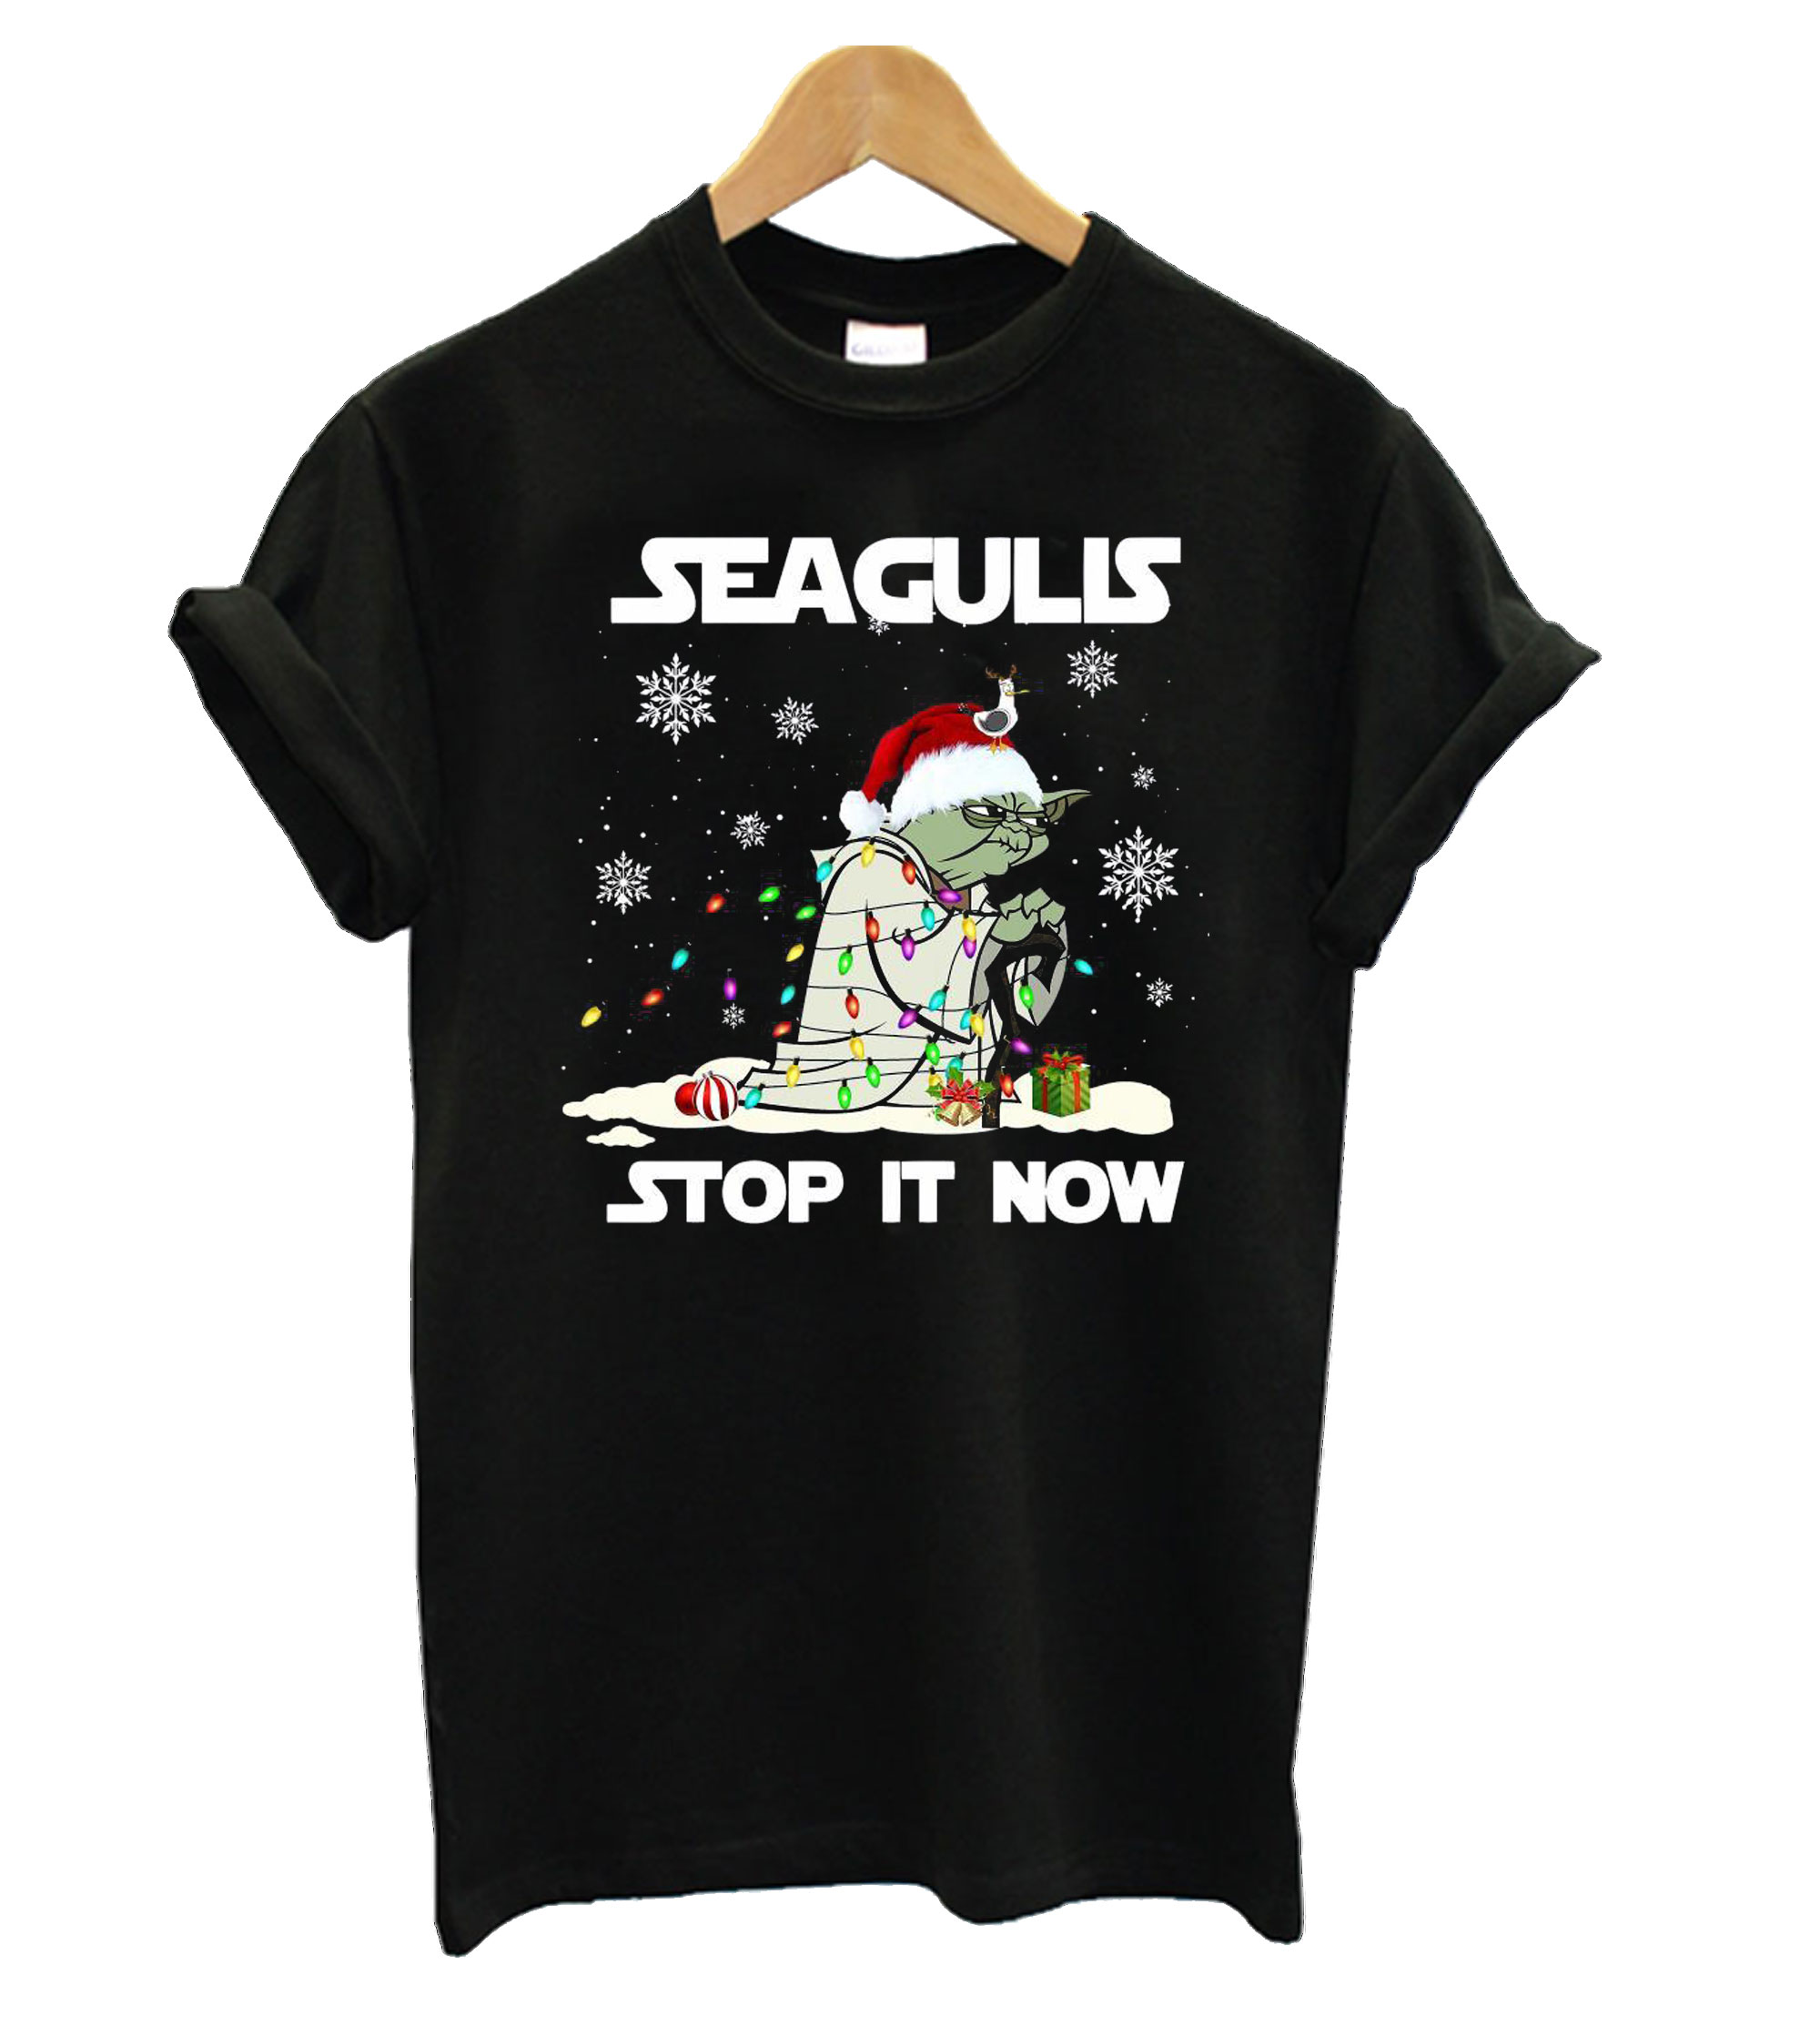 Star Wars Yoda Santa Seagulls Stop It Now Christmas T shirt